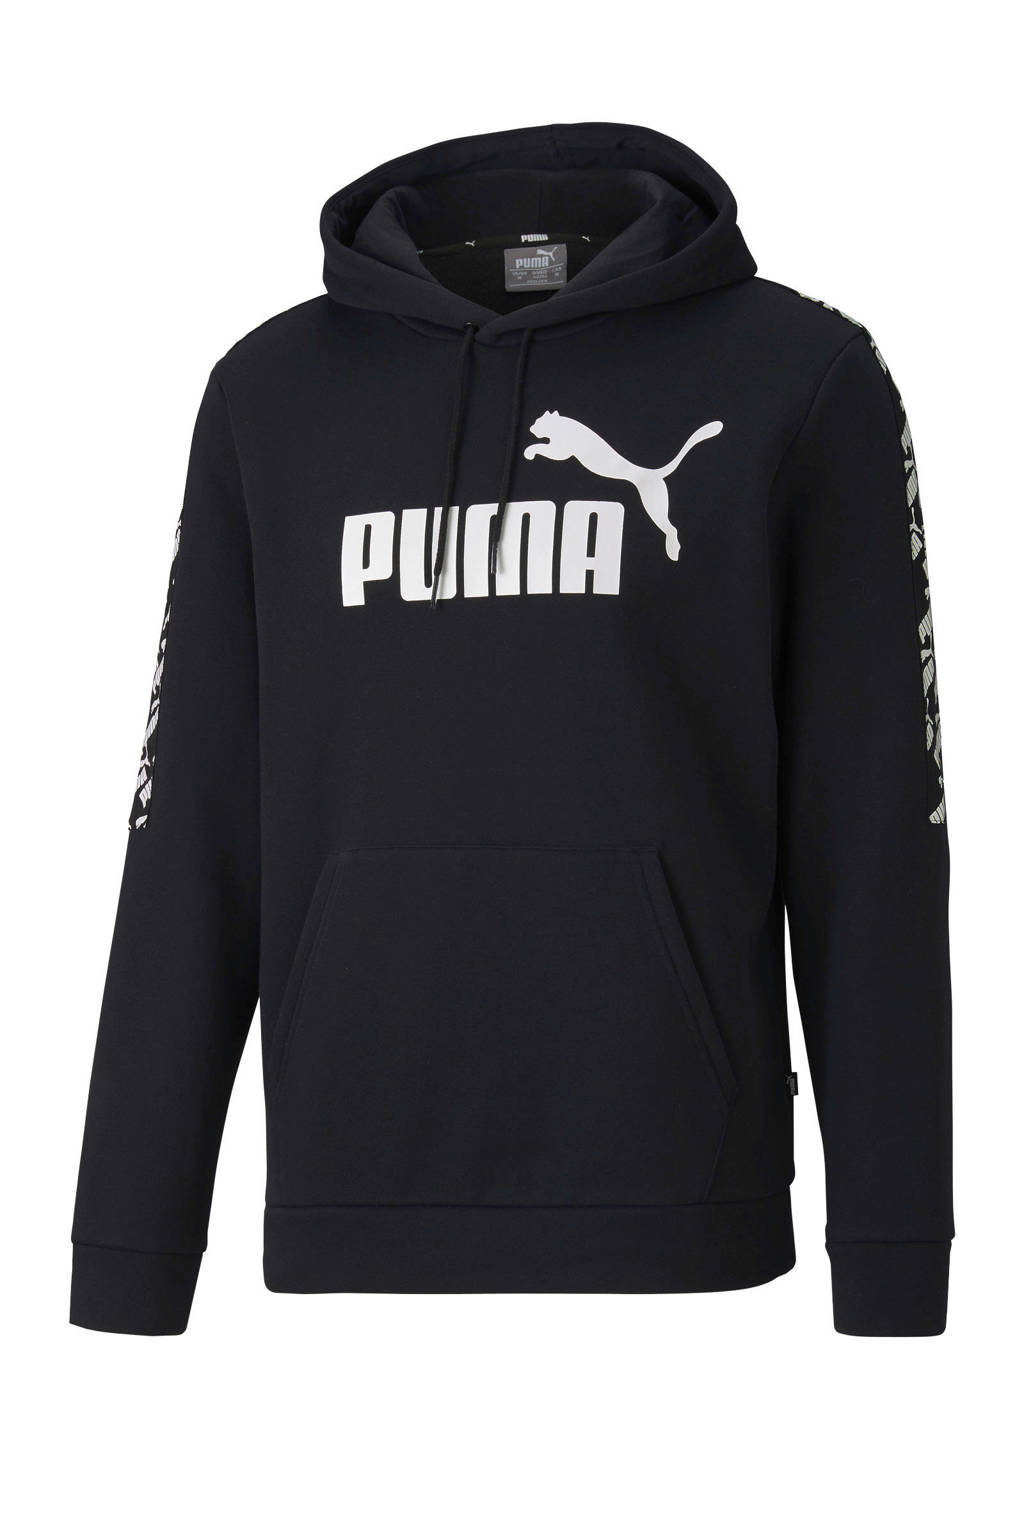 Puma   hoodie zwart, Zwart